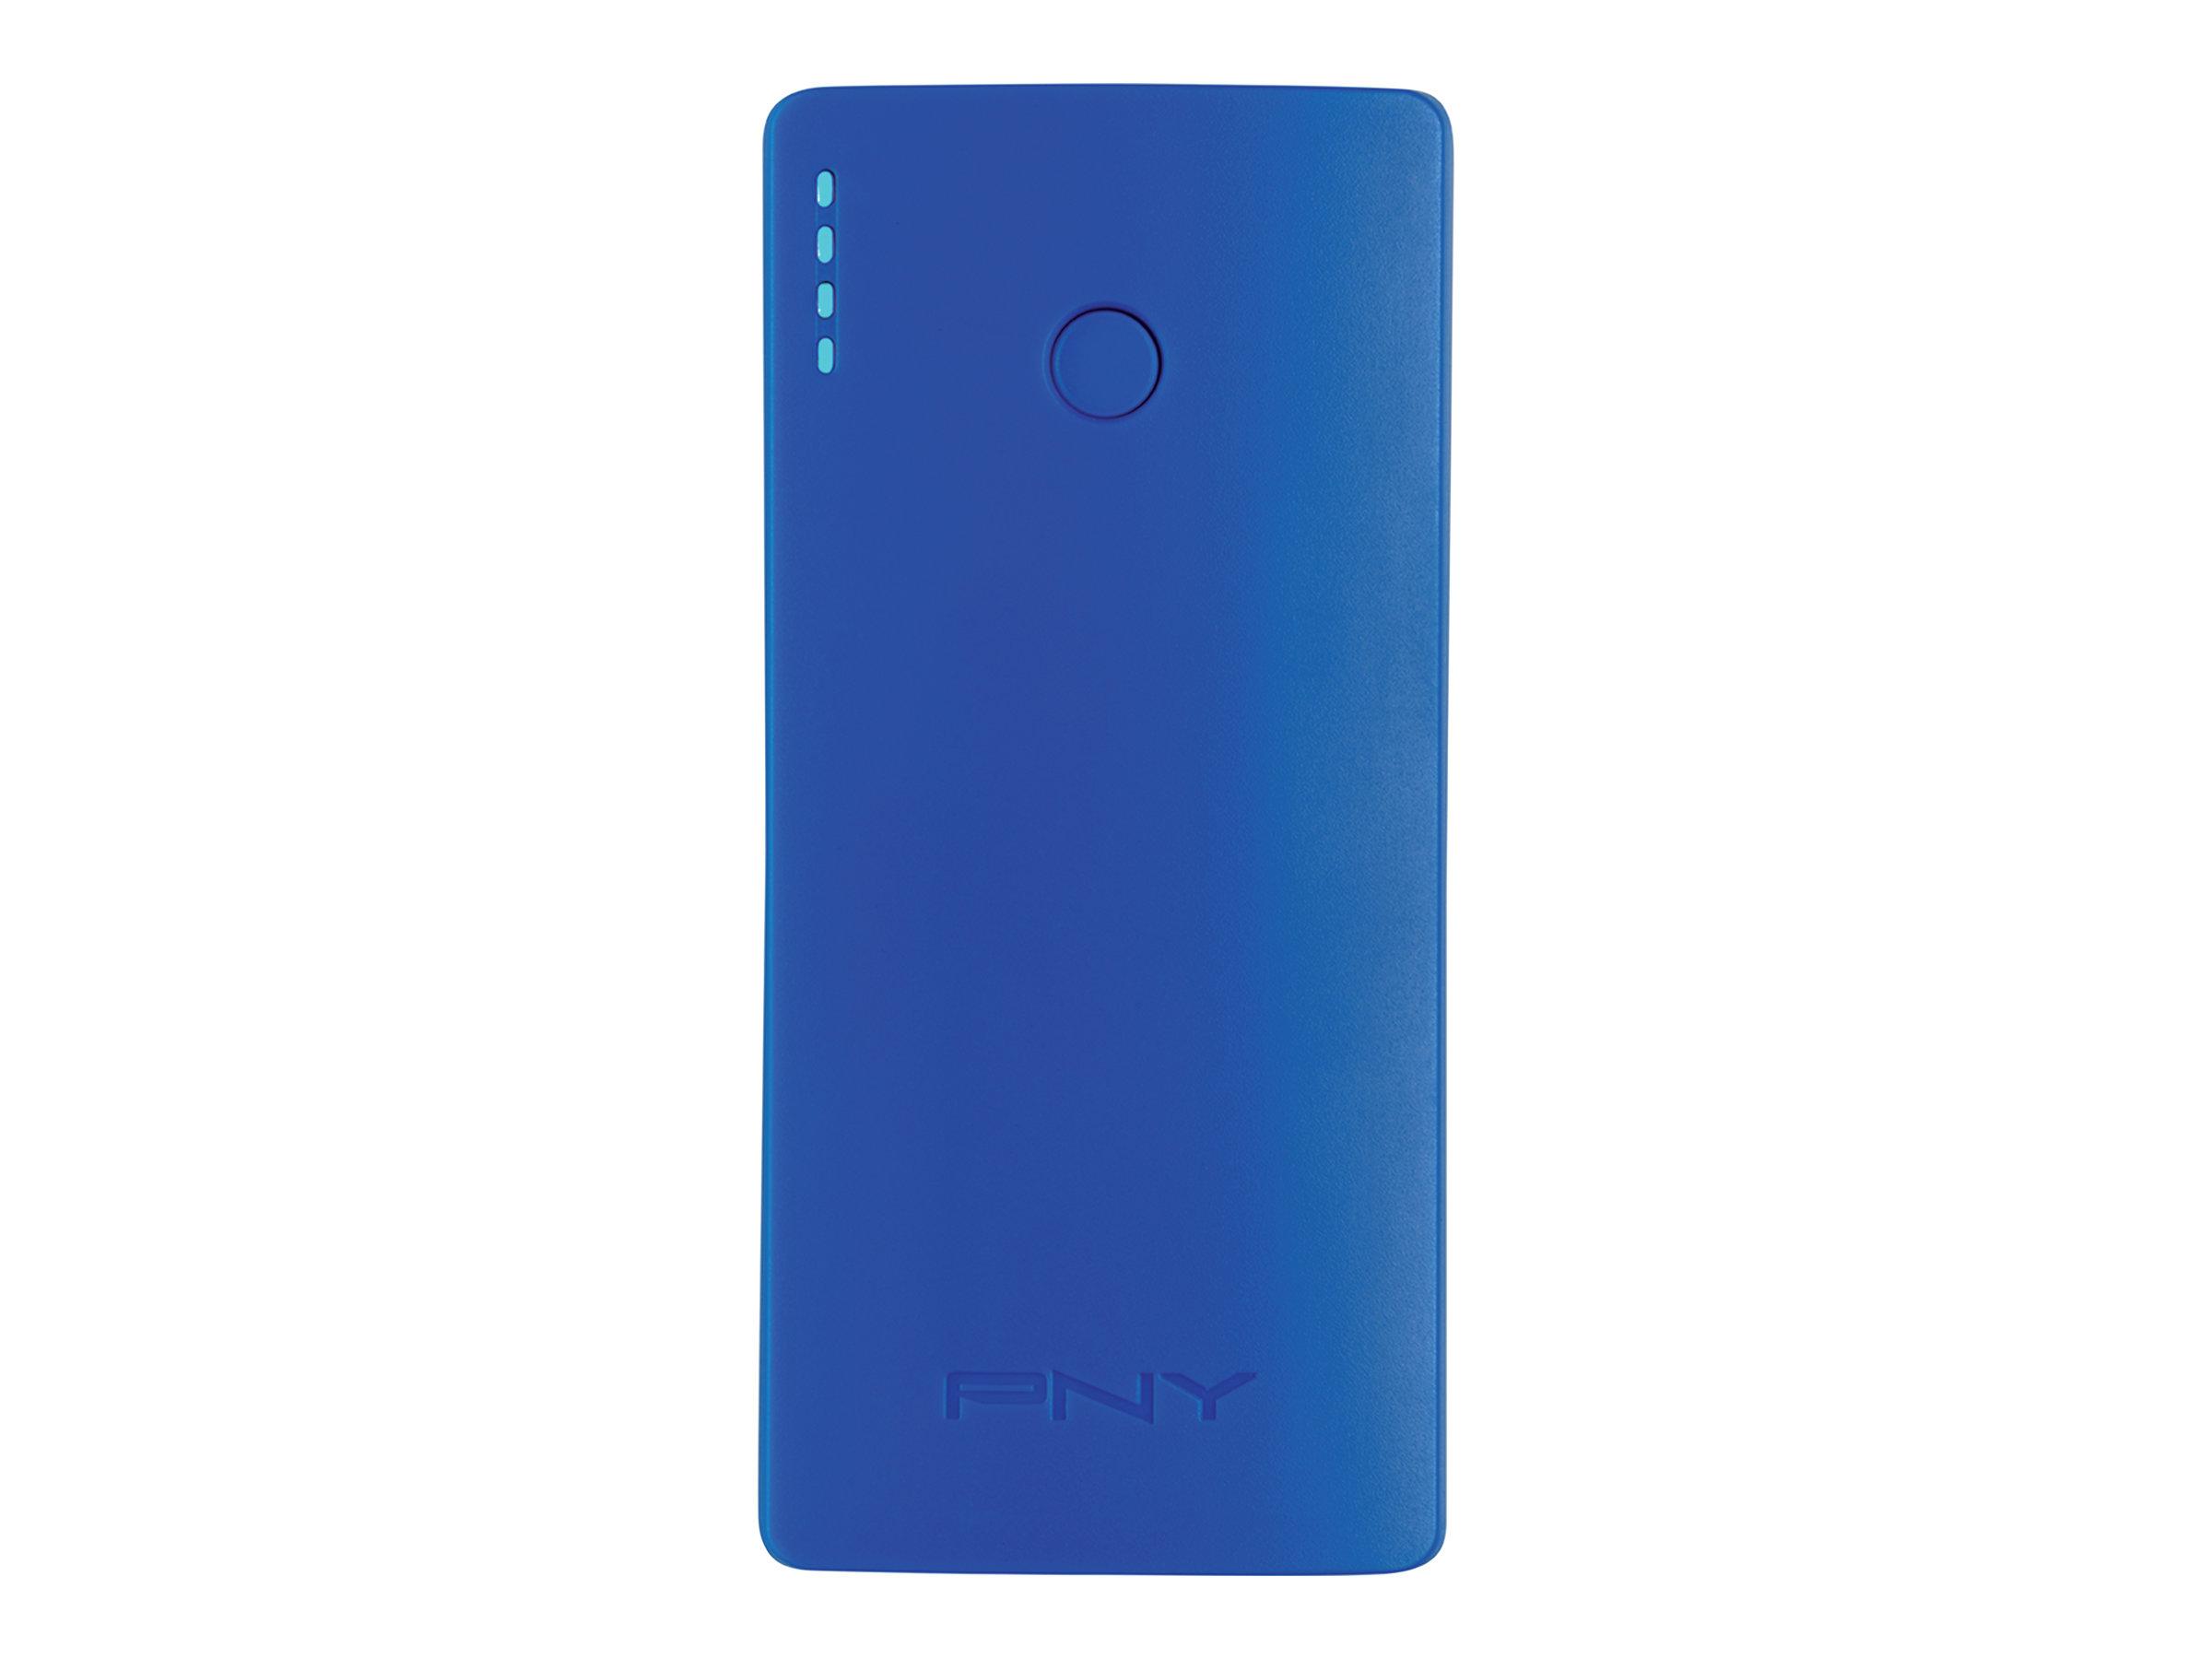 PNY PowerPack Curve 5200 - Powerbank - 5200 mAh - 2.1 A (USB) - auf Kabel: Micro-USB - Blau